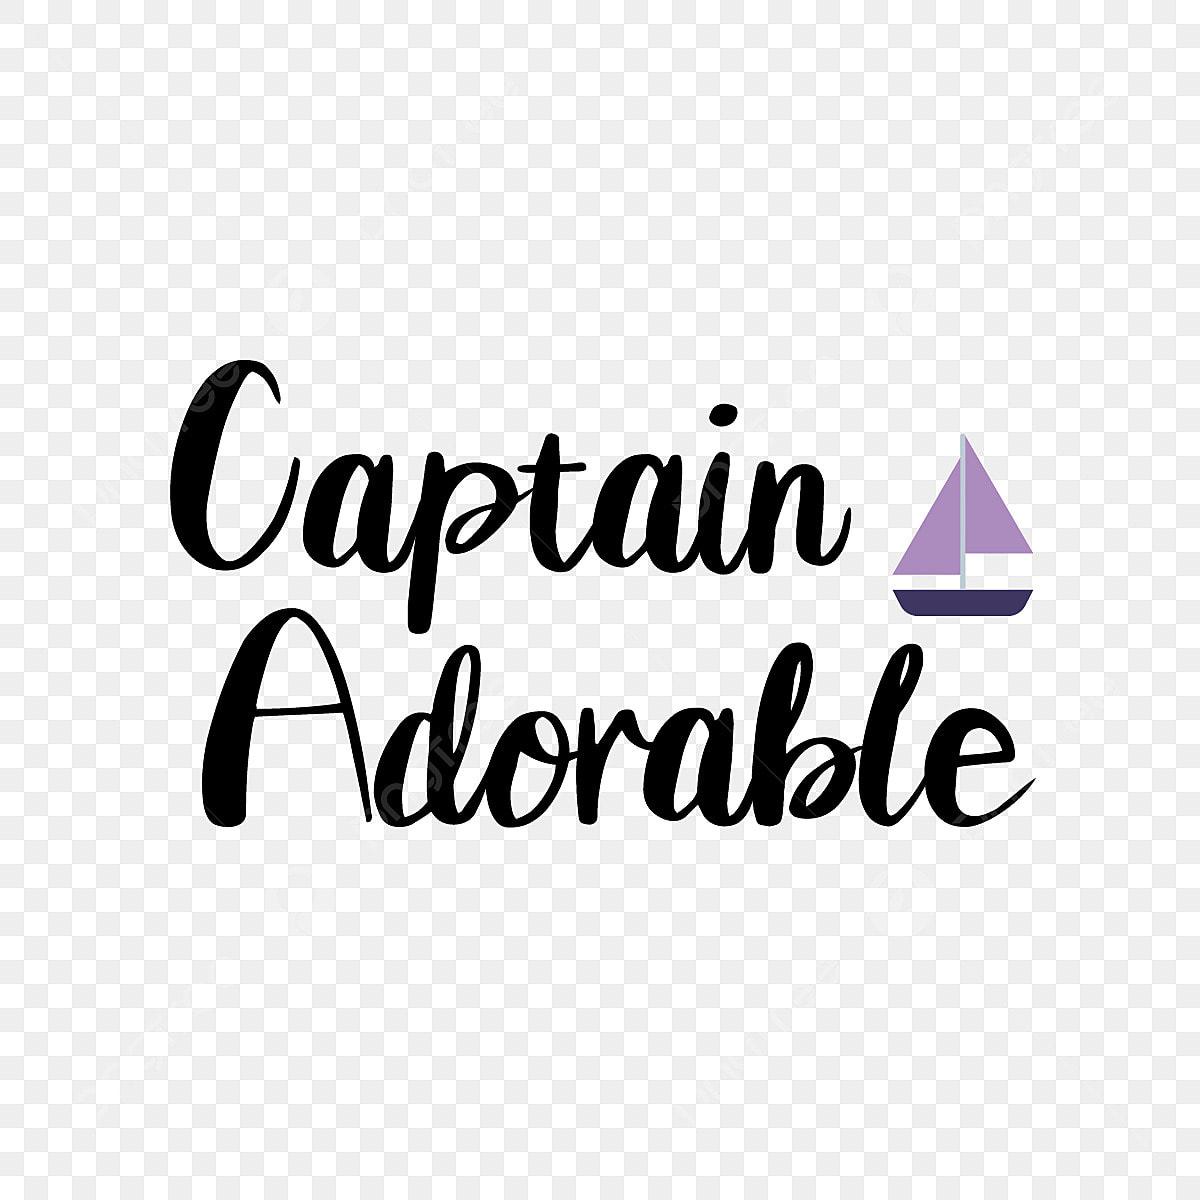 Svg Hand Drawn Captain Cute Black English Alphabet Font Design Boat Illustration Font Effect Eps For Free Download